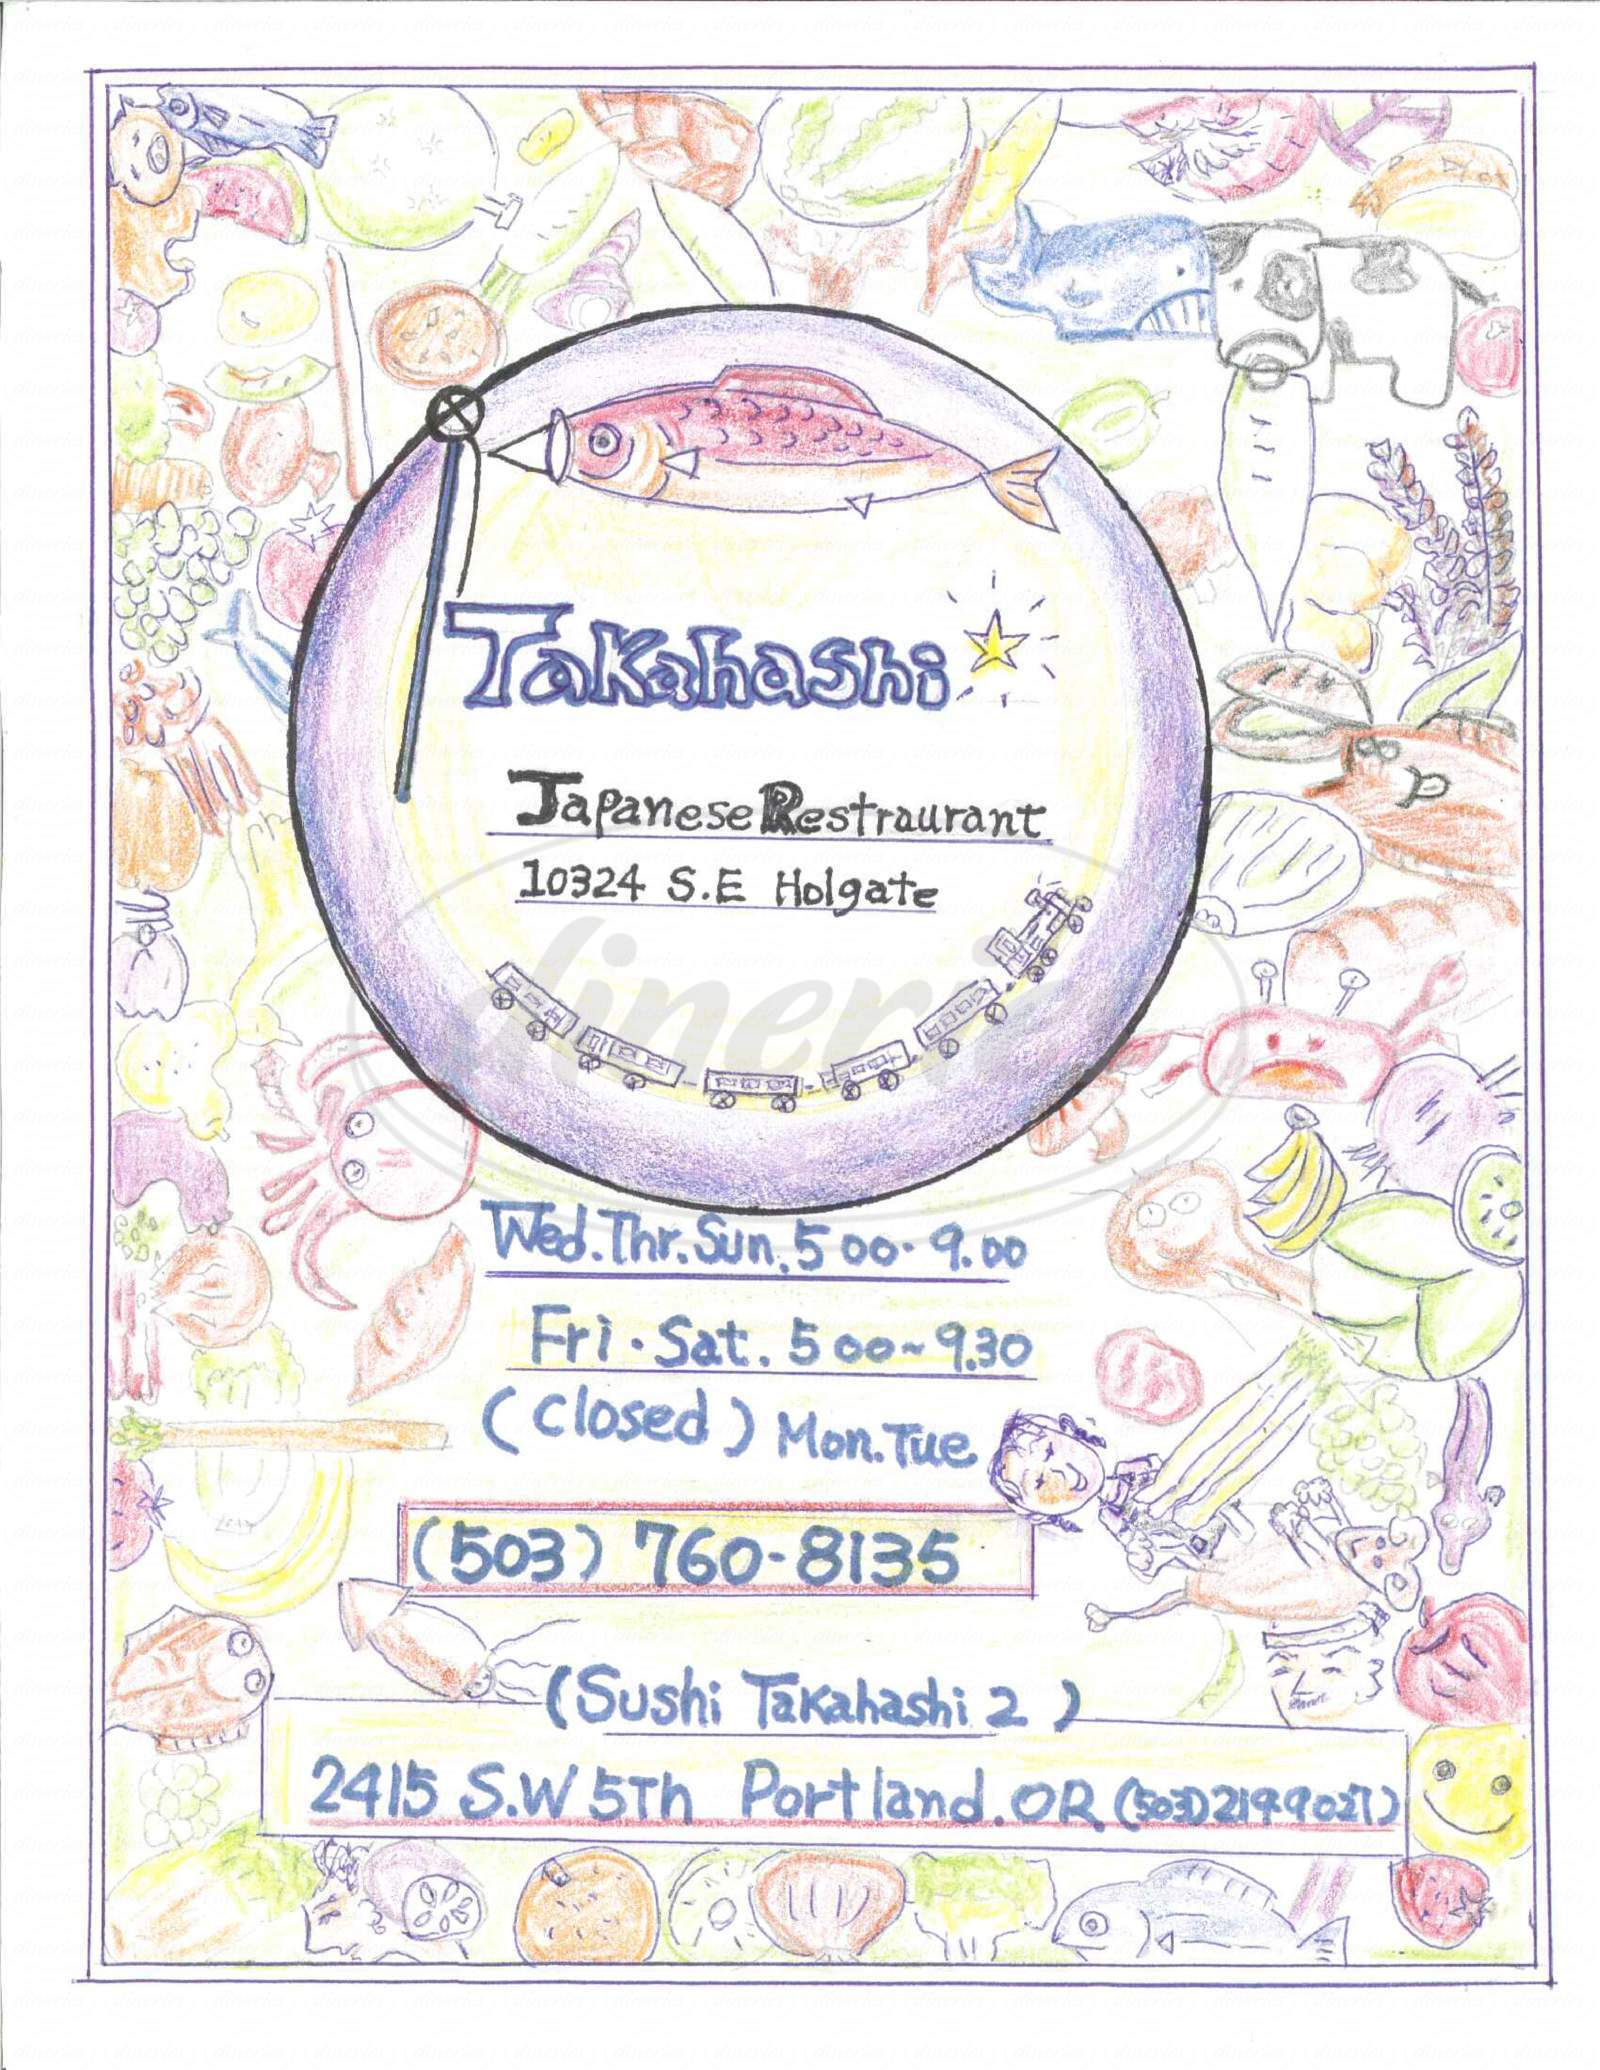 menu for Takahashi